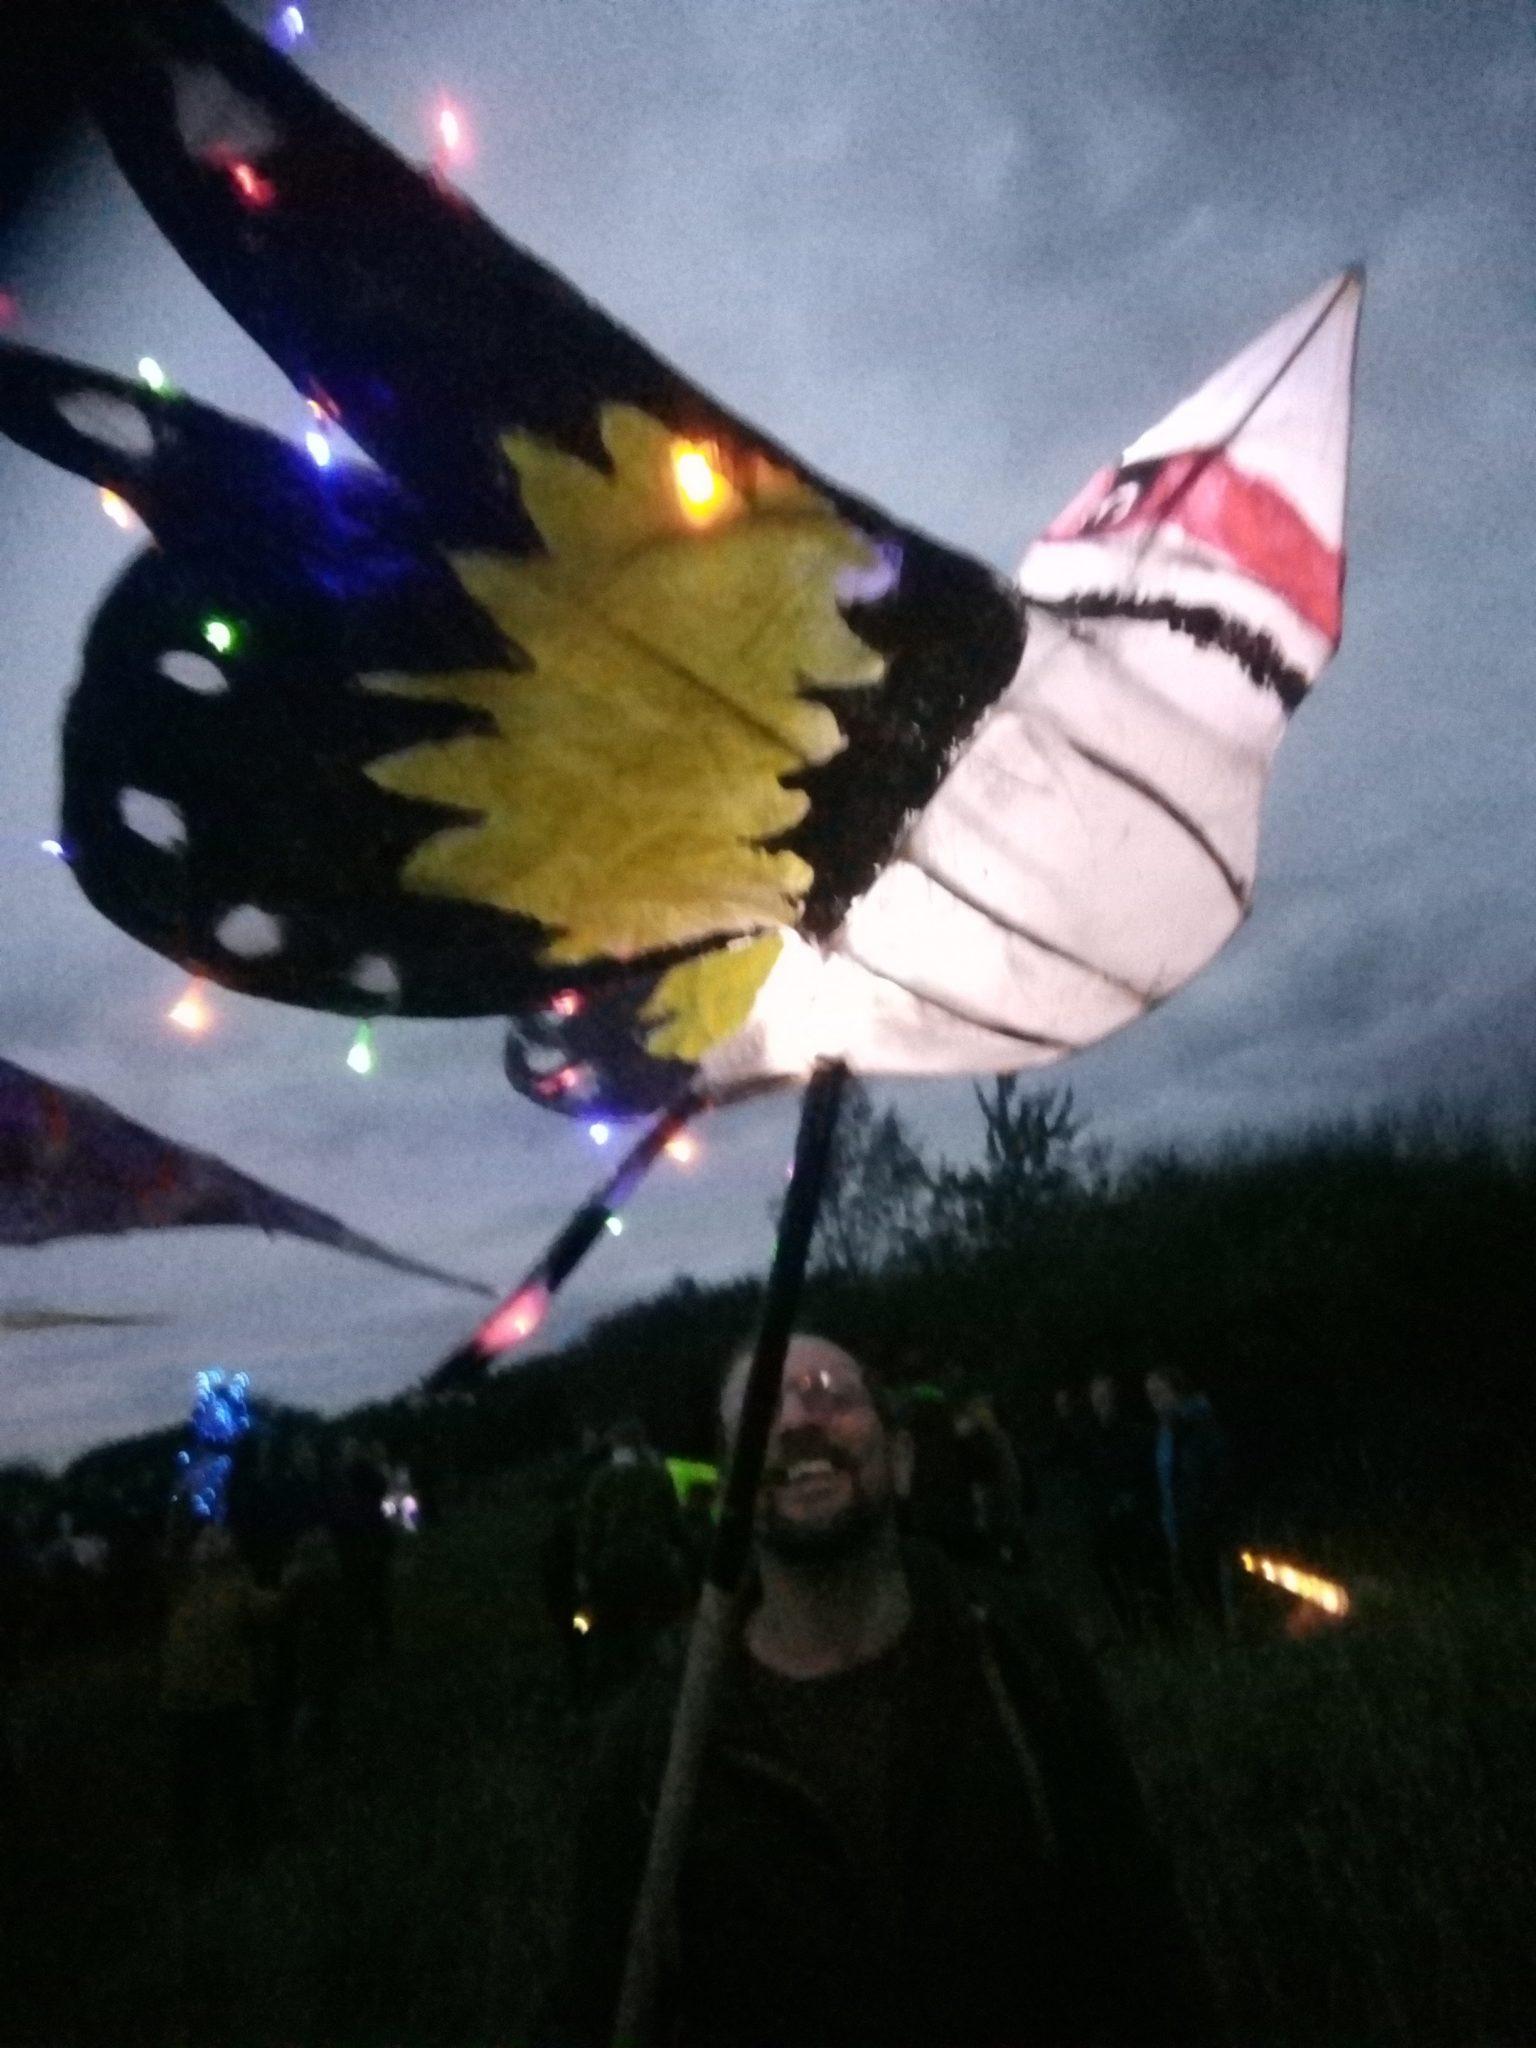 Goldfinch lantern held high